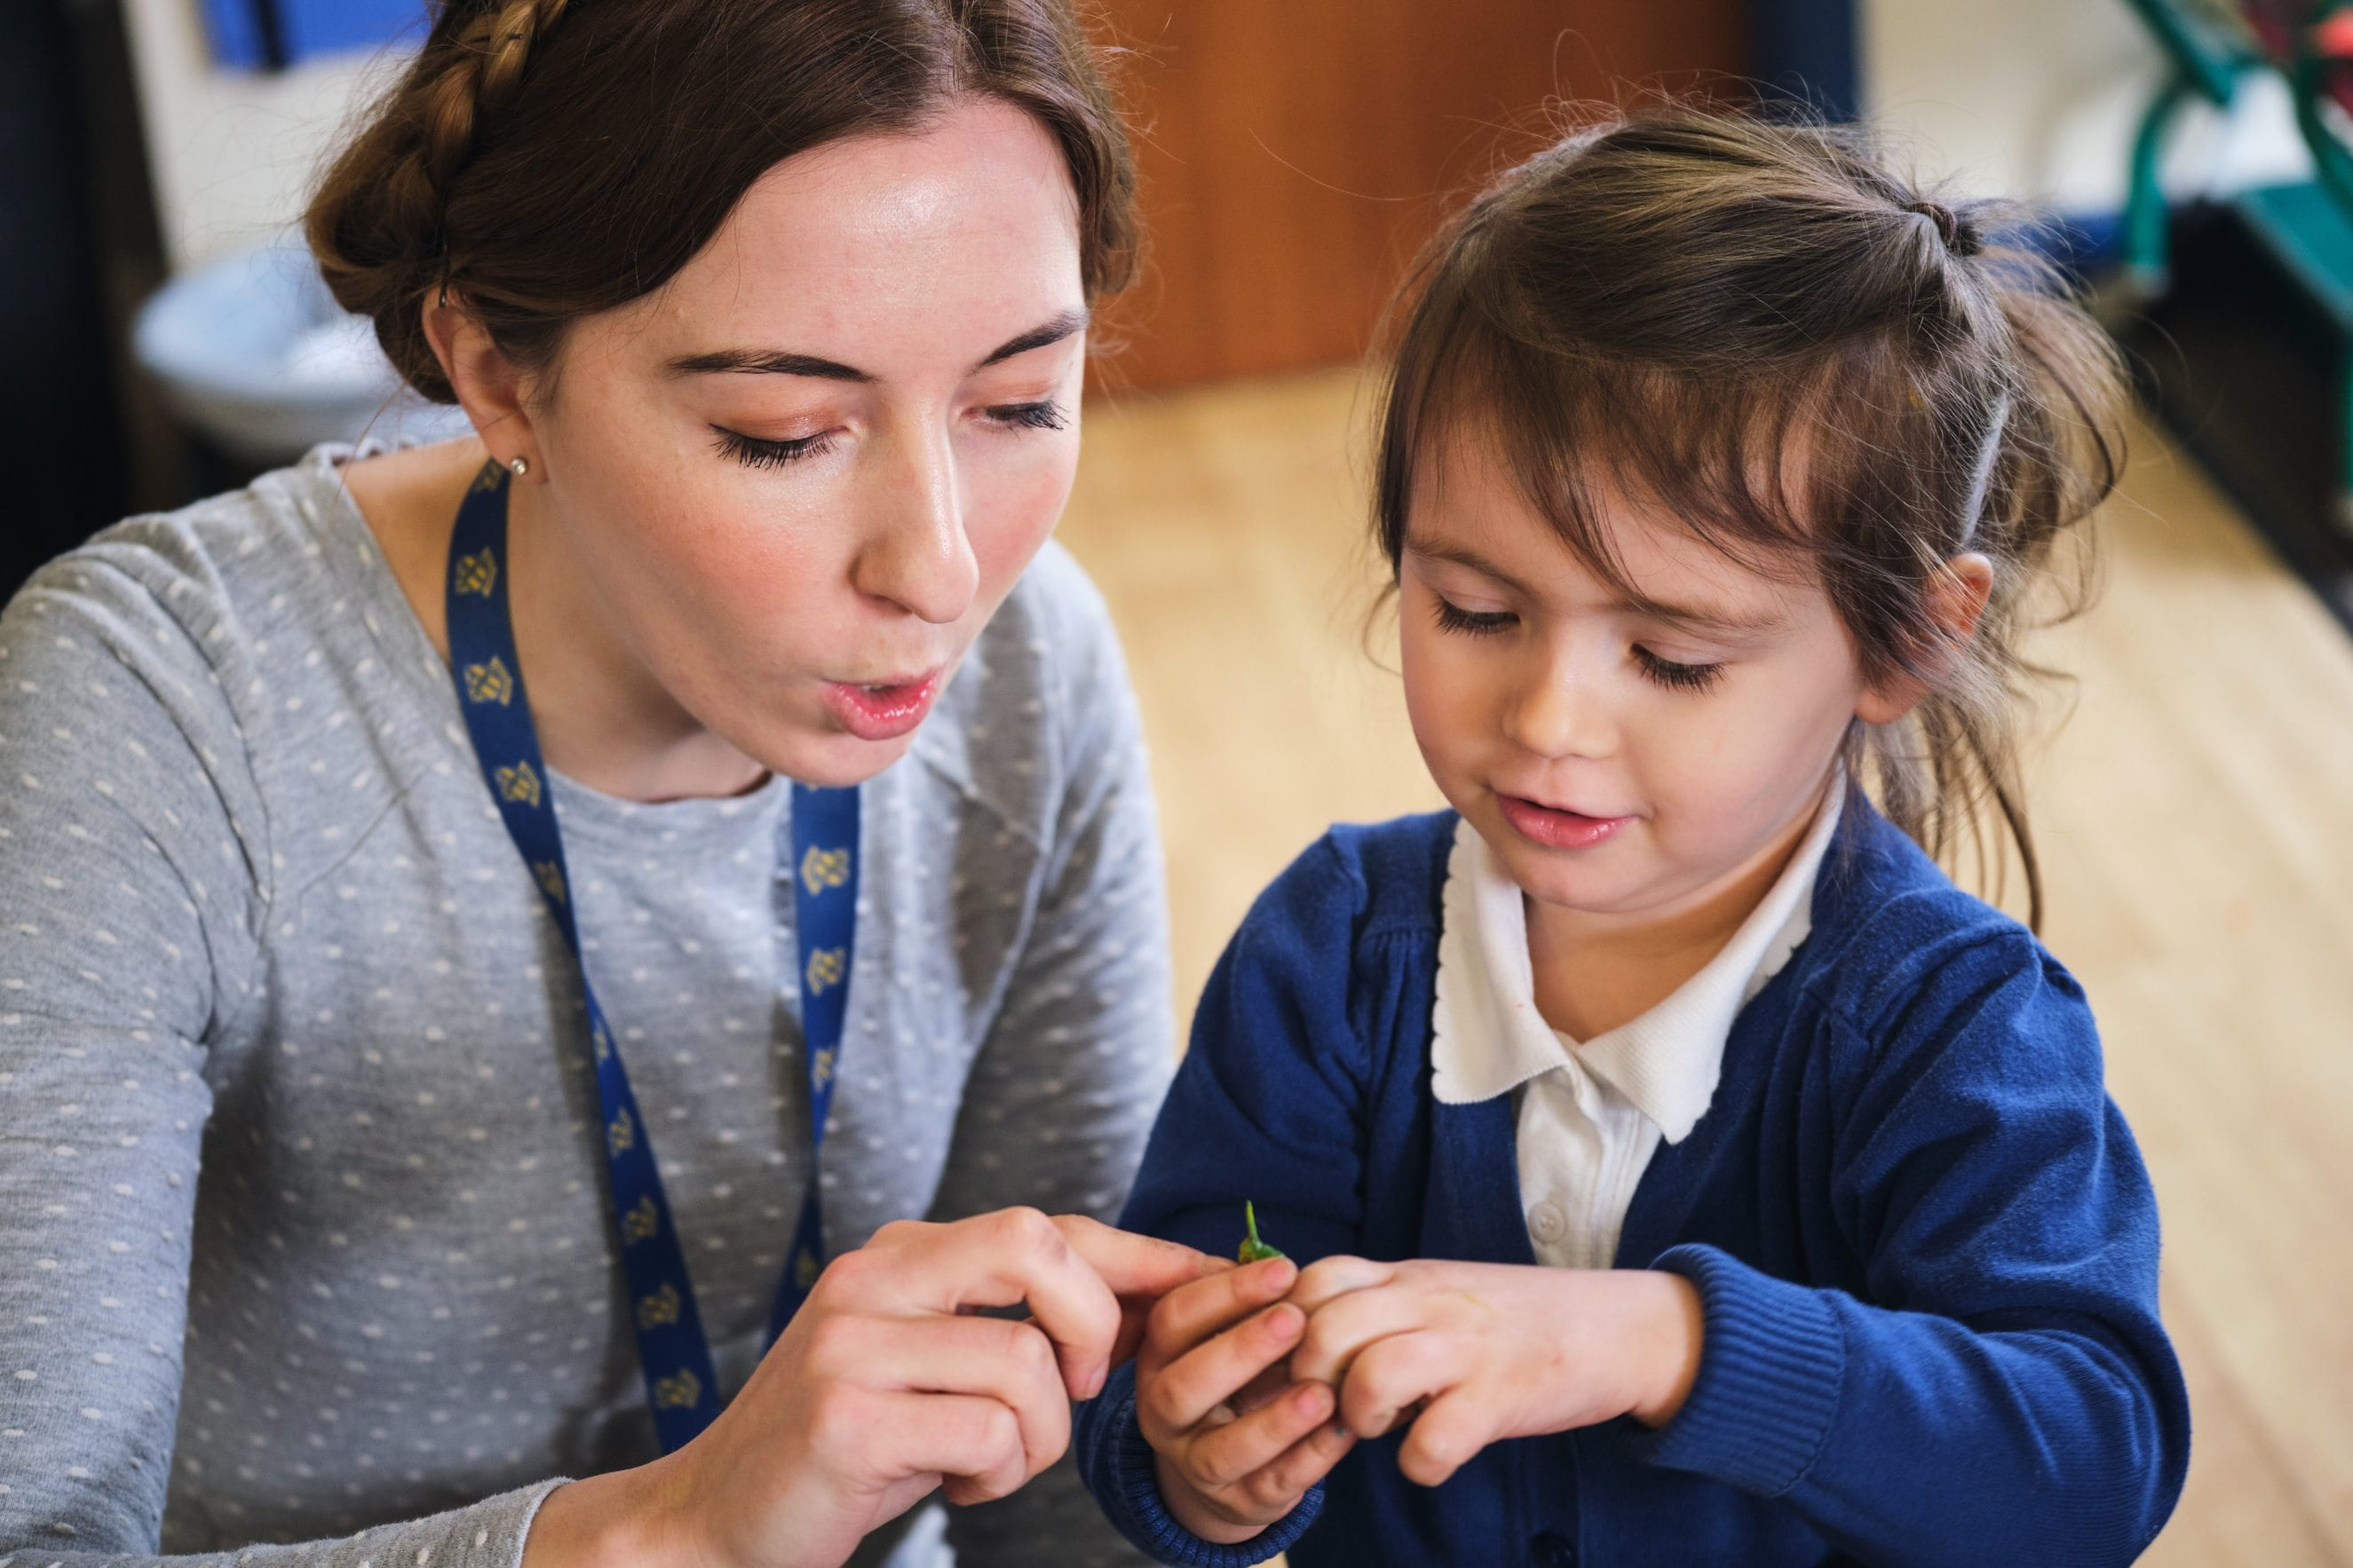 Applications now open for teacher training